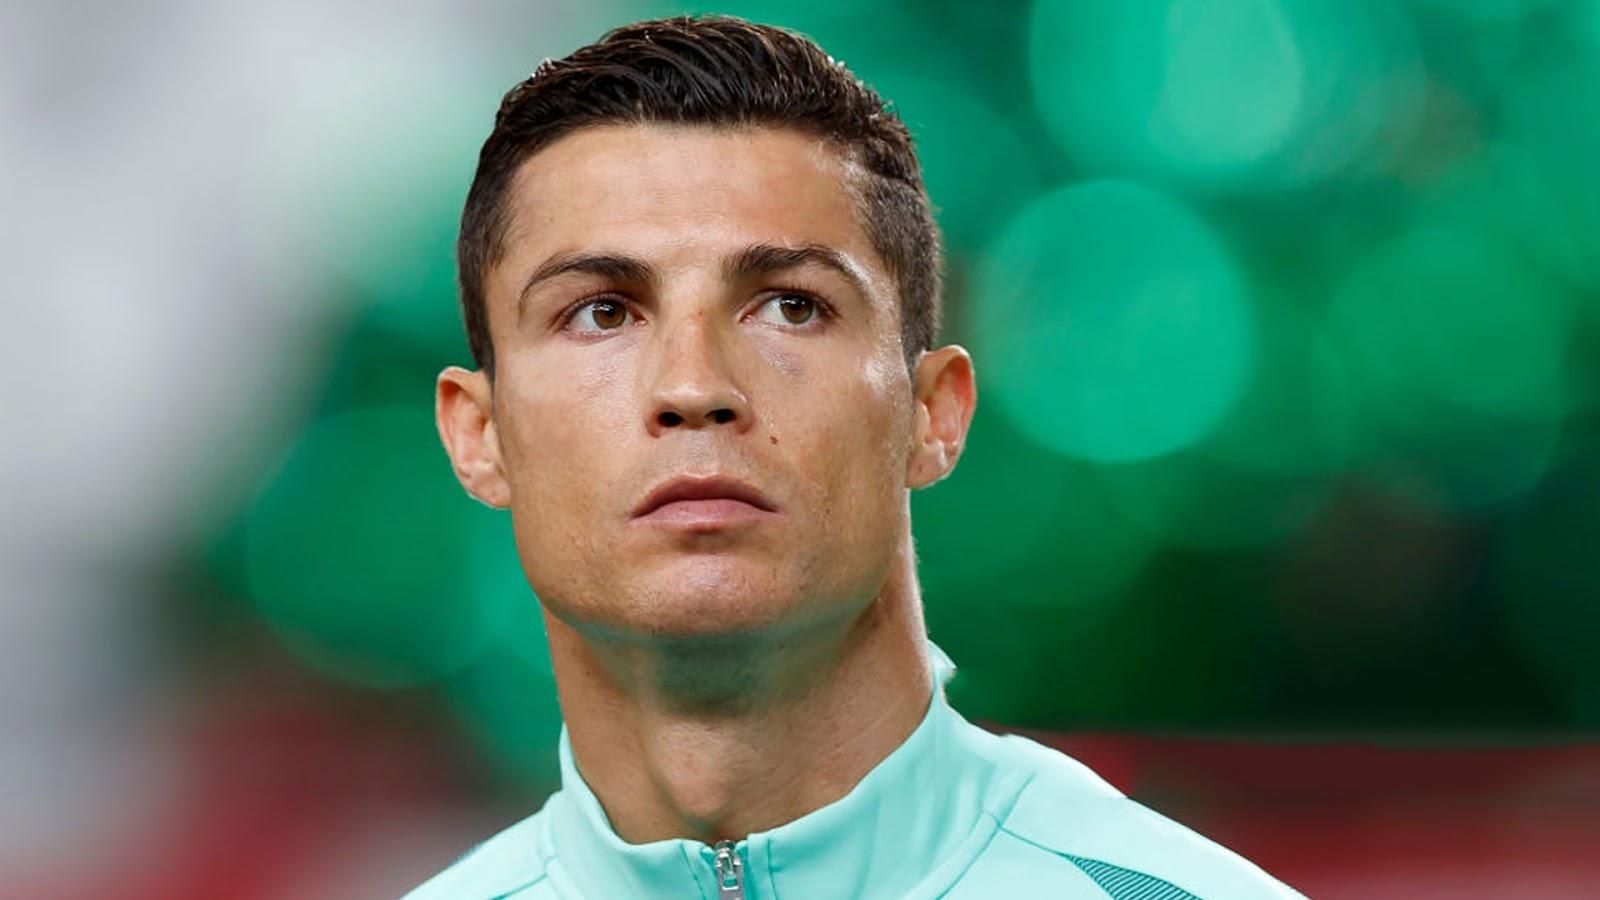 Cristiano Ronaldo HD Wallpapers Download Free 1080p ...